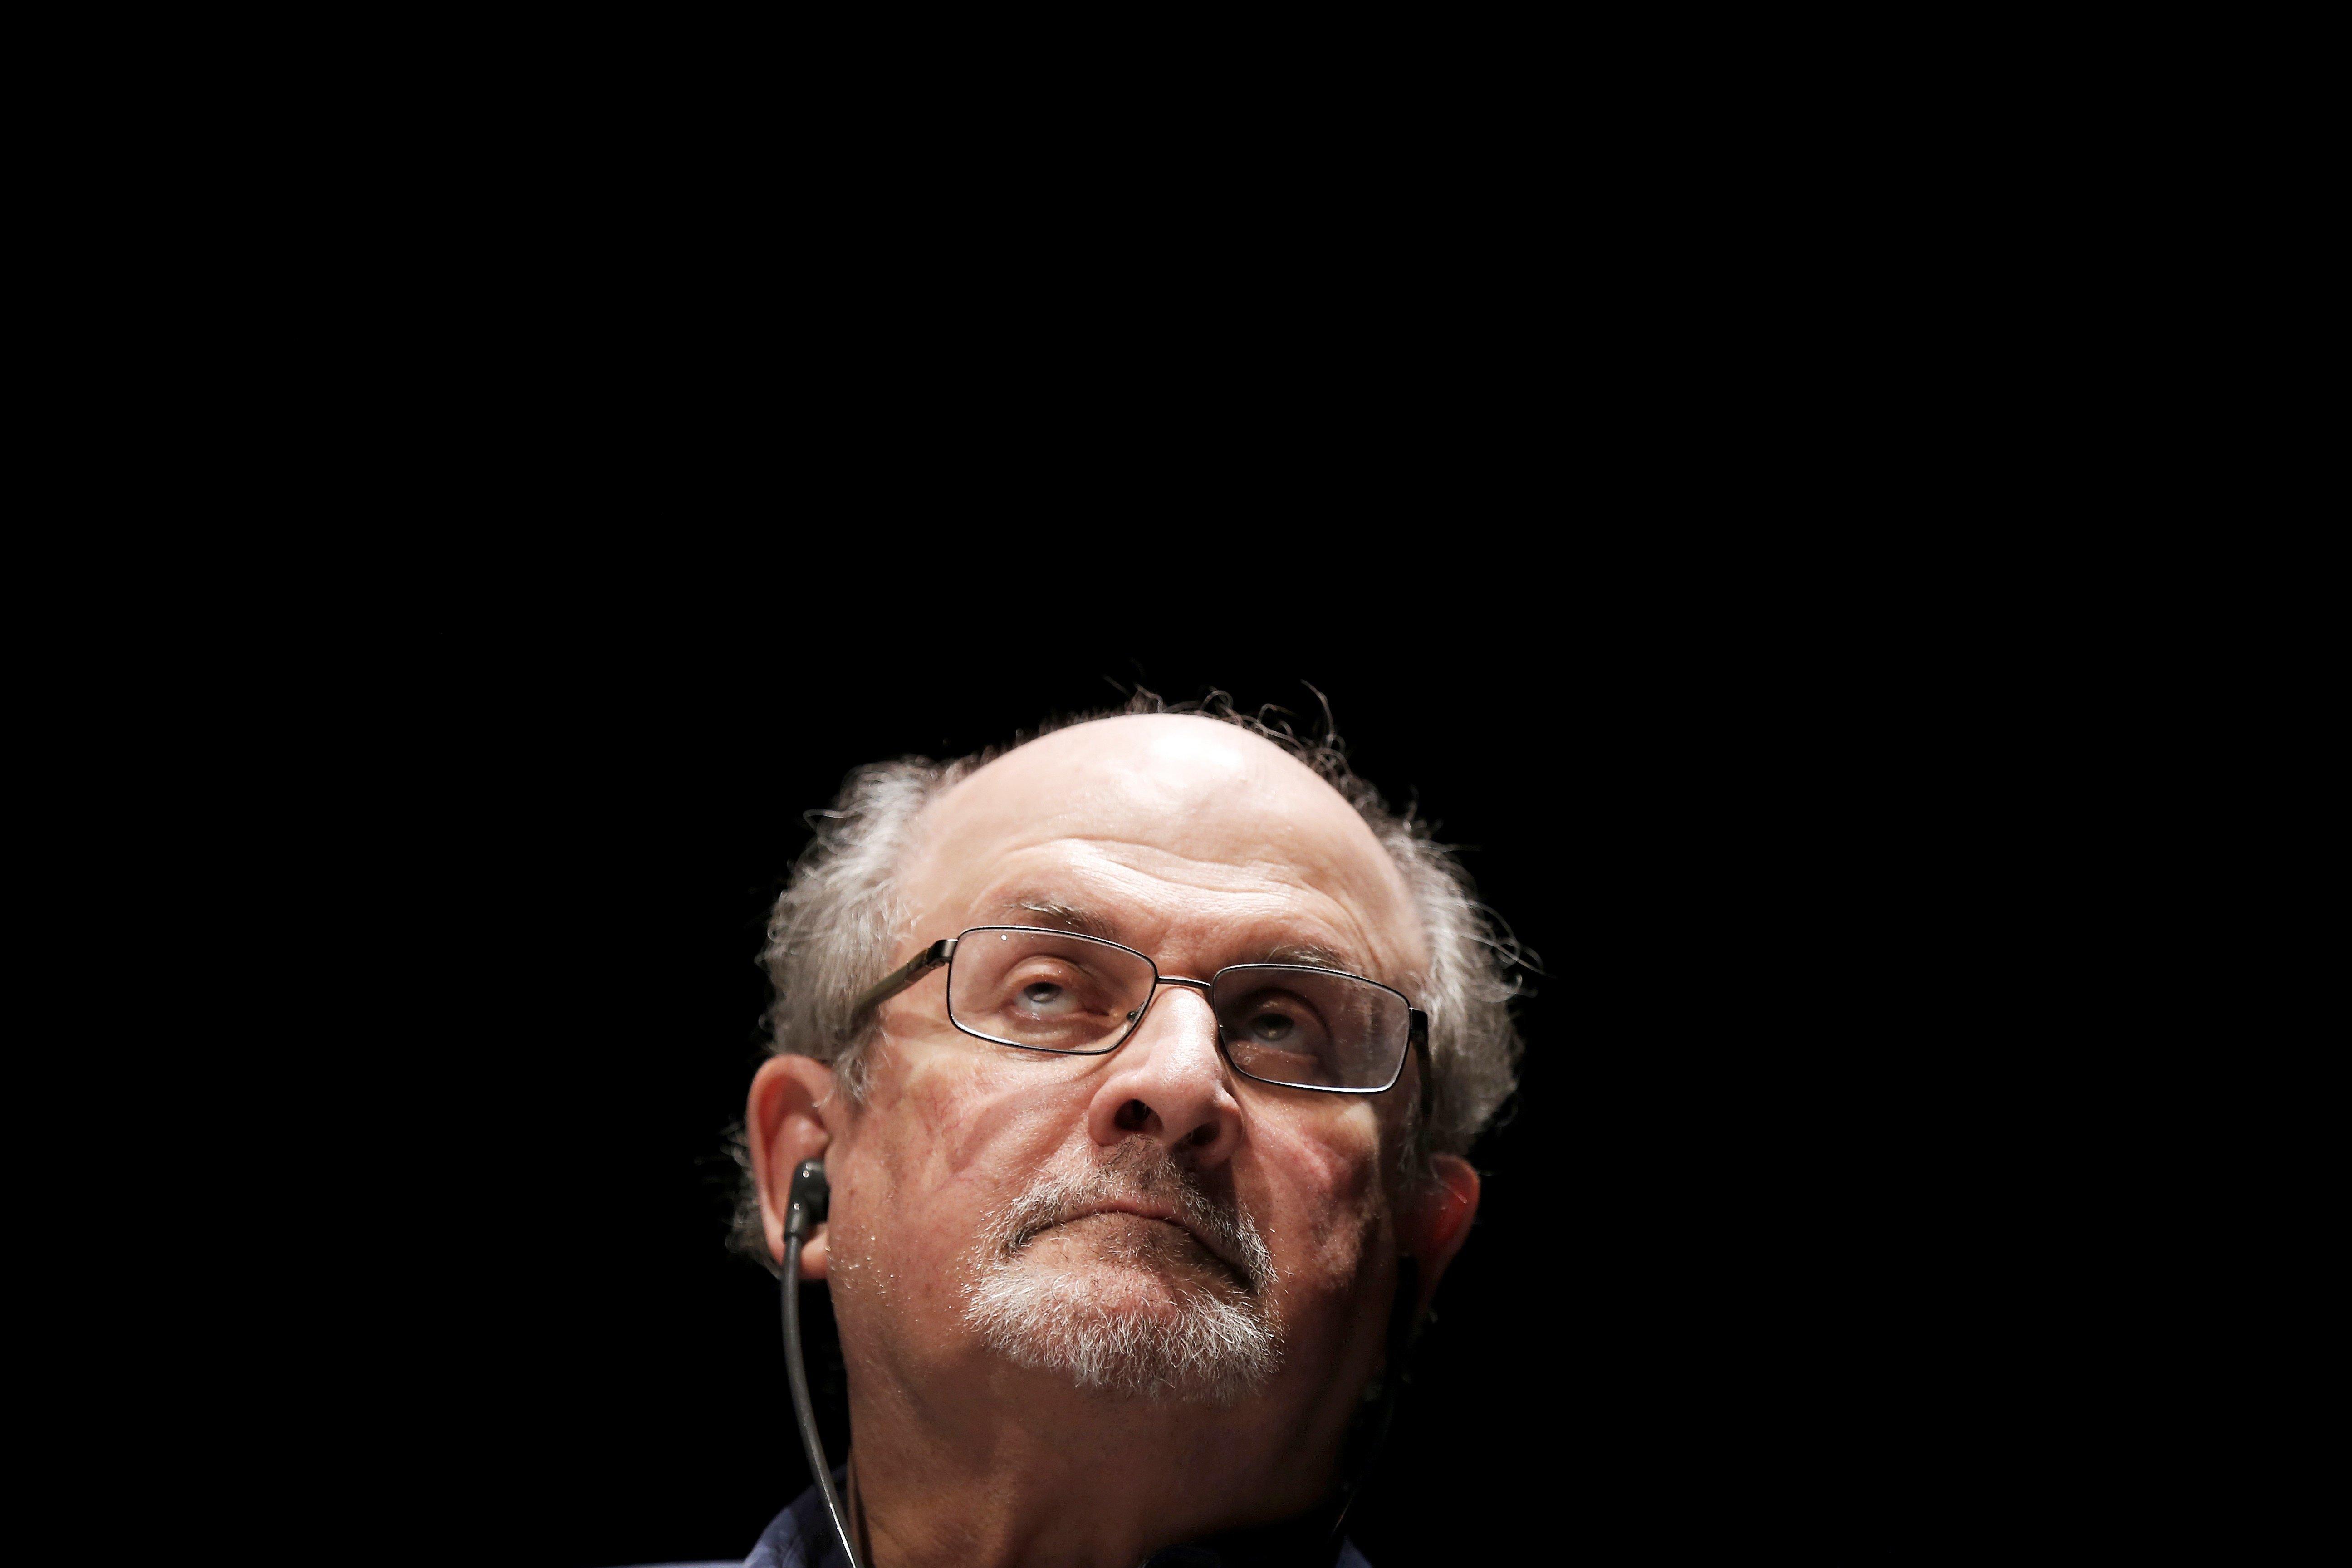 Author Salman Rushdie Slams Trump On Facebook: 'Come On, America.